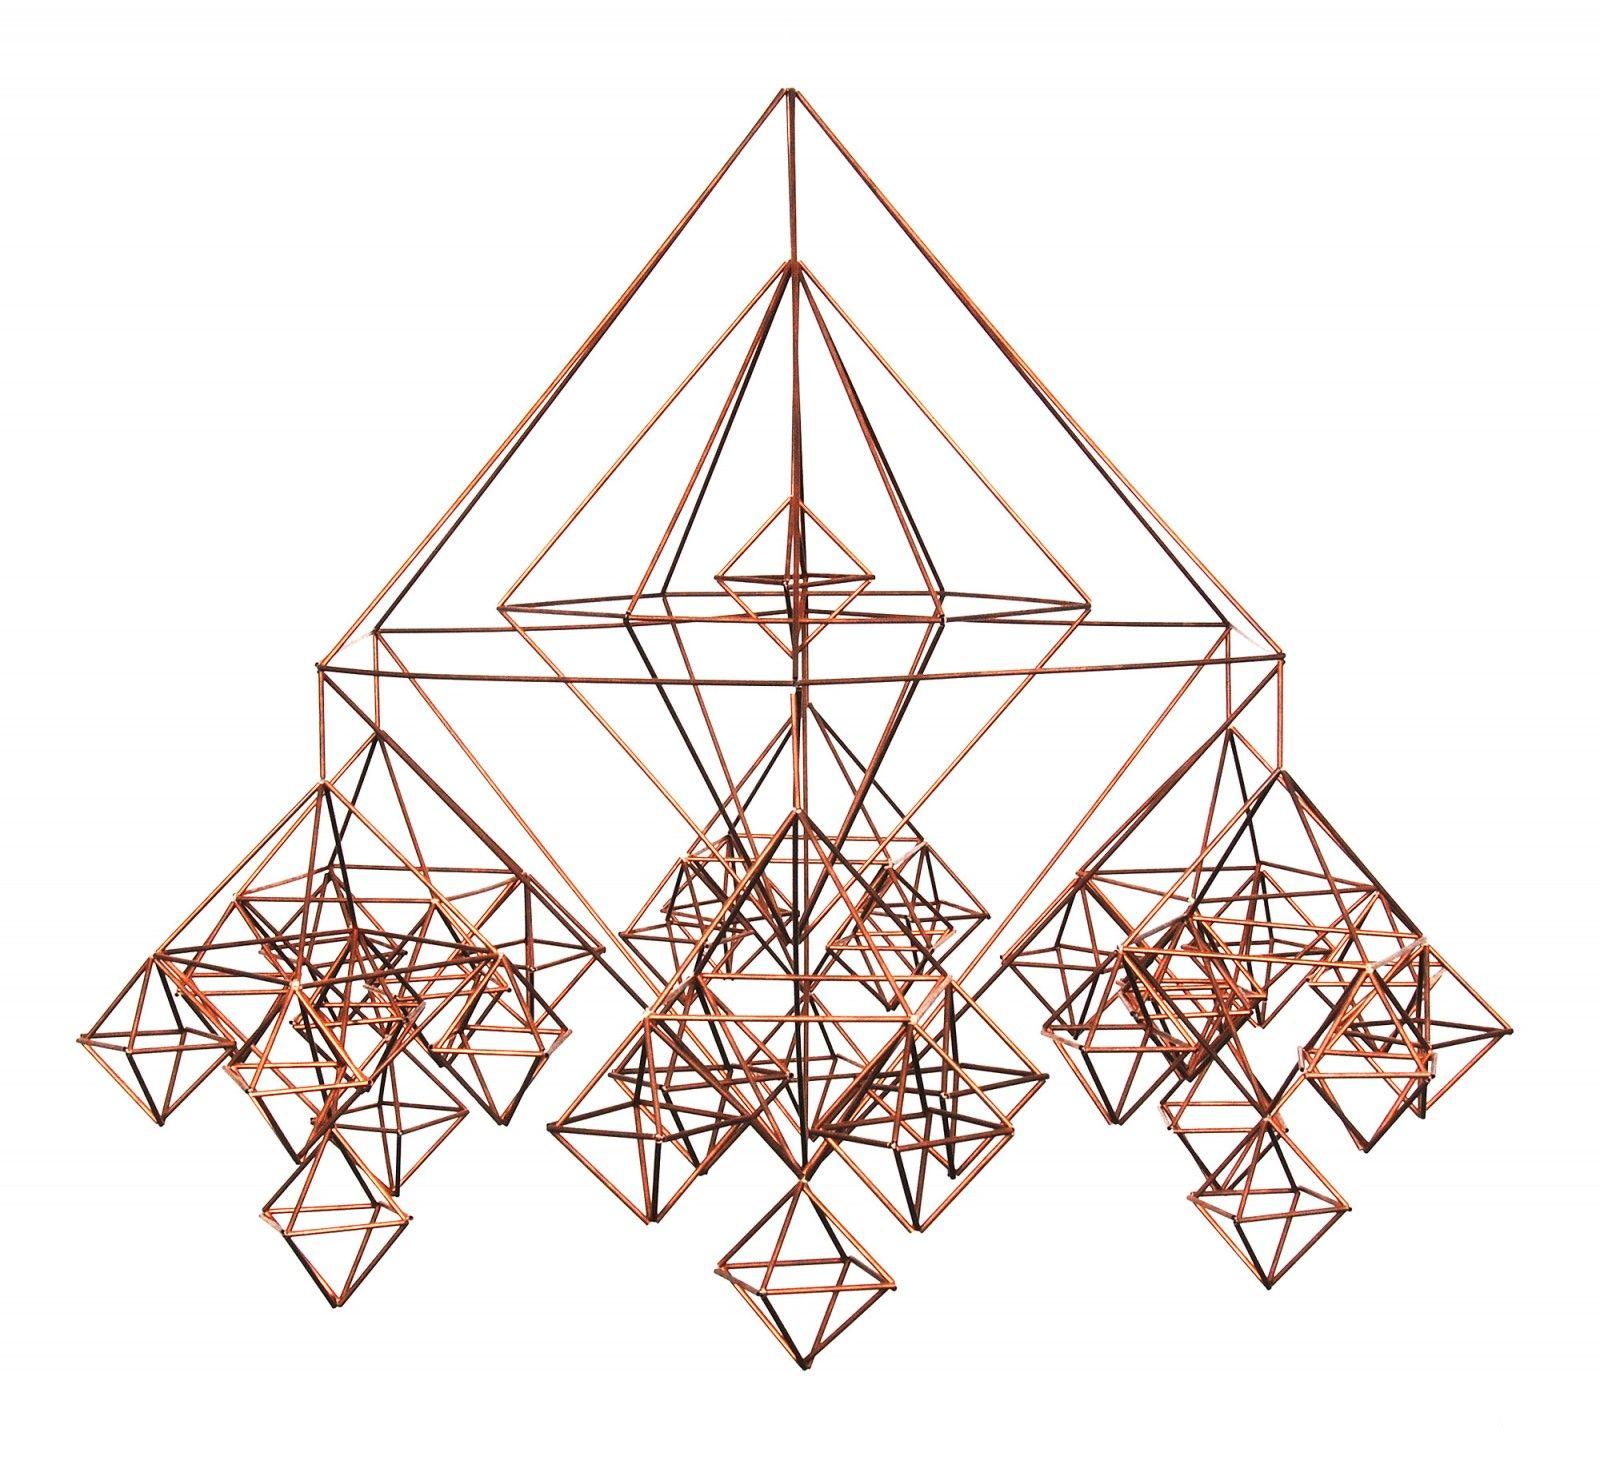 Straw pajaki polish chandelier design pajaki chandelier himmeli straw pajaki polish chandelier design arubaitofo Choice Image